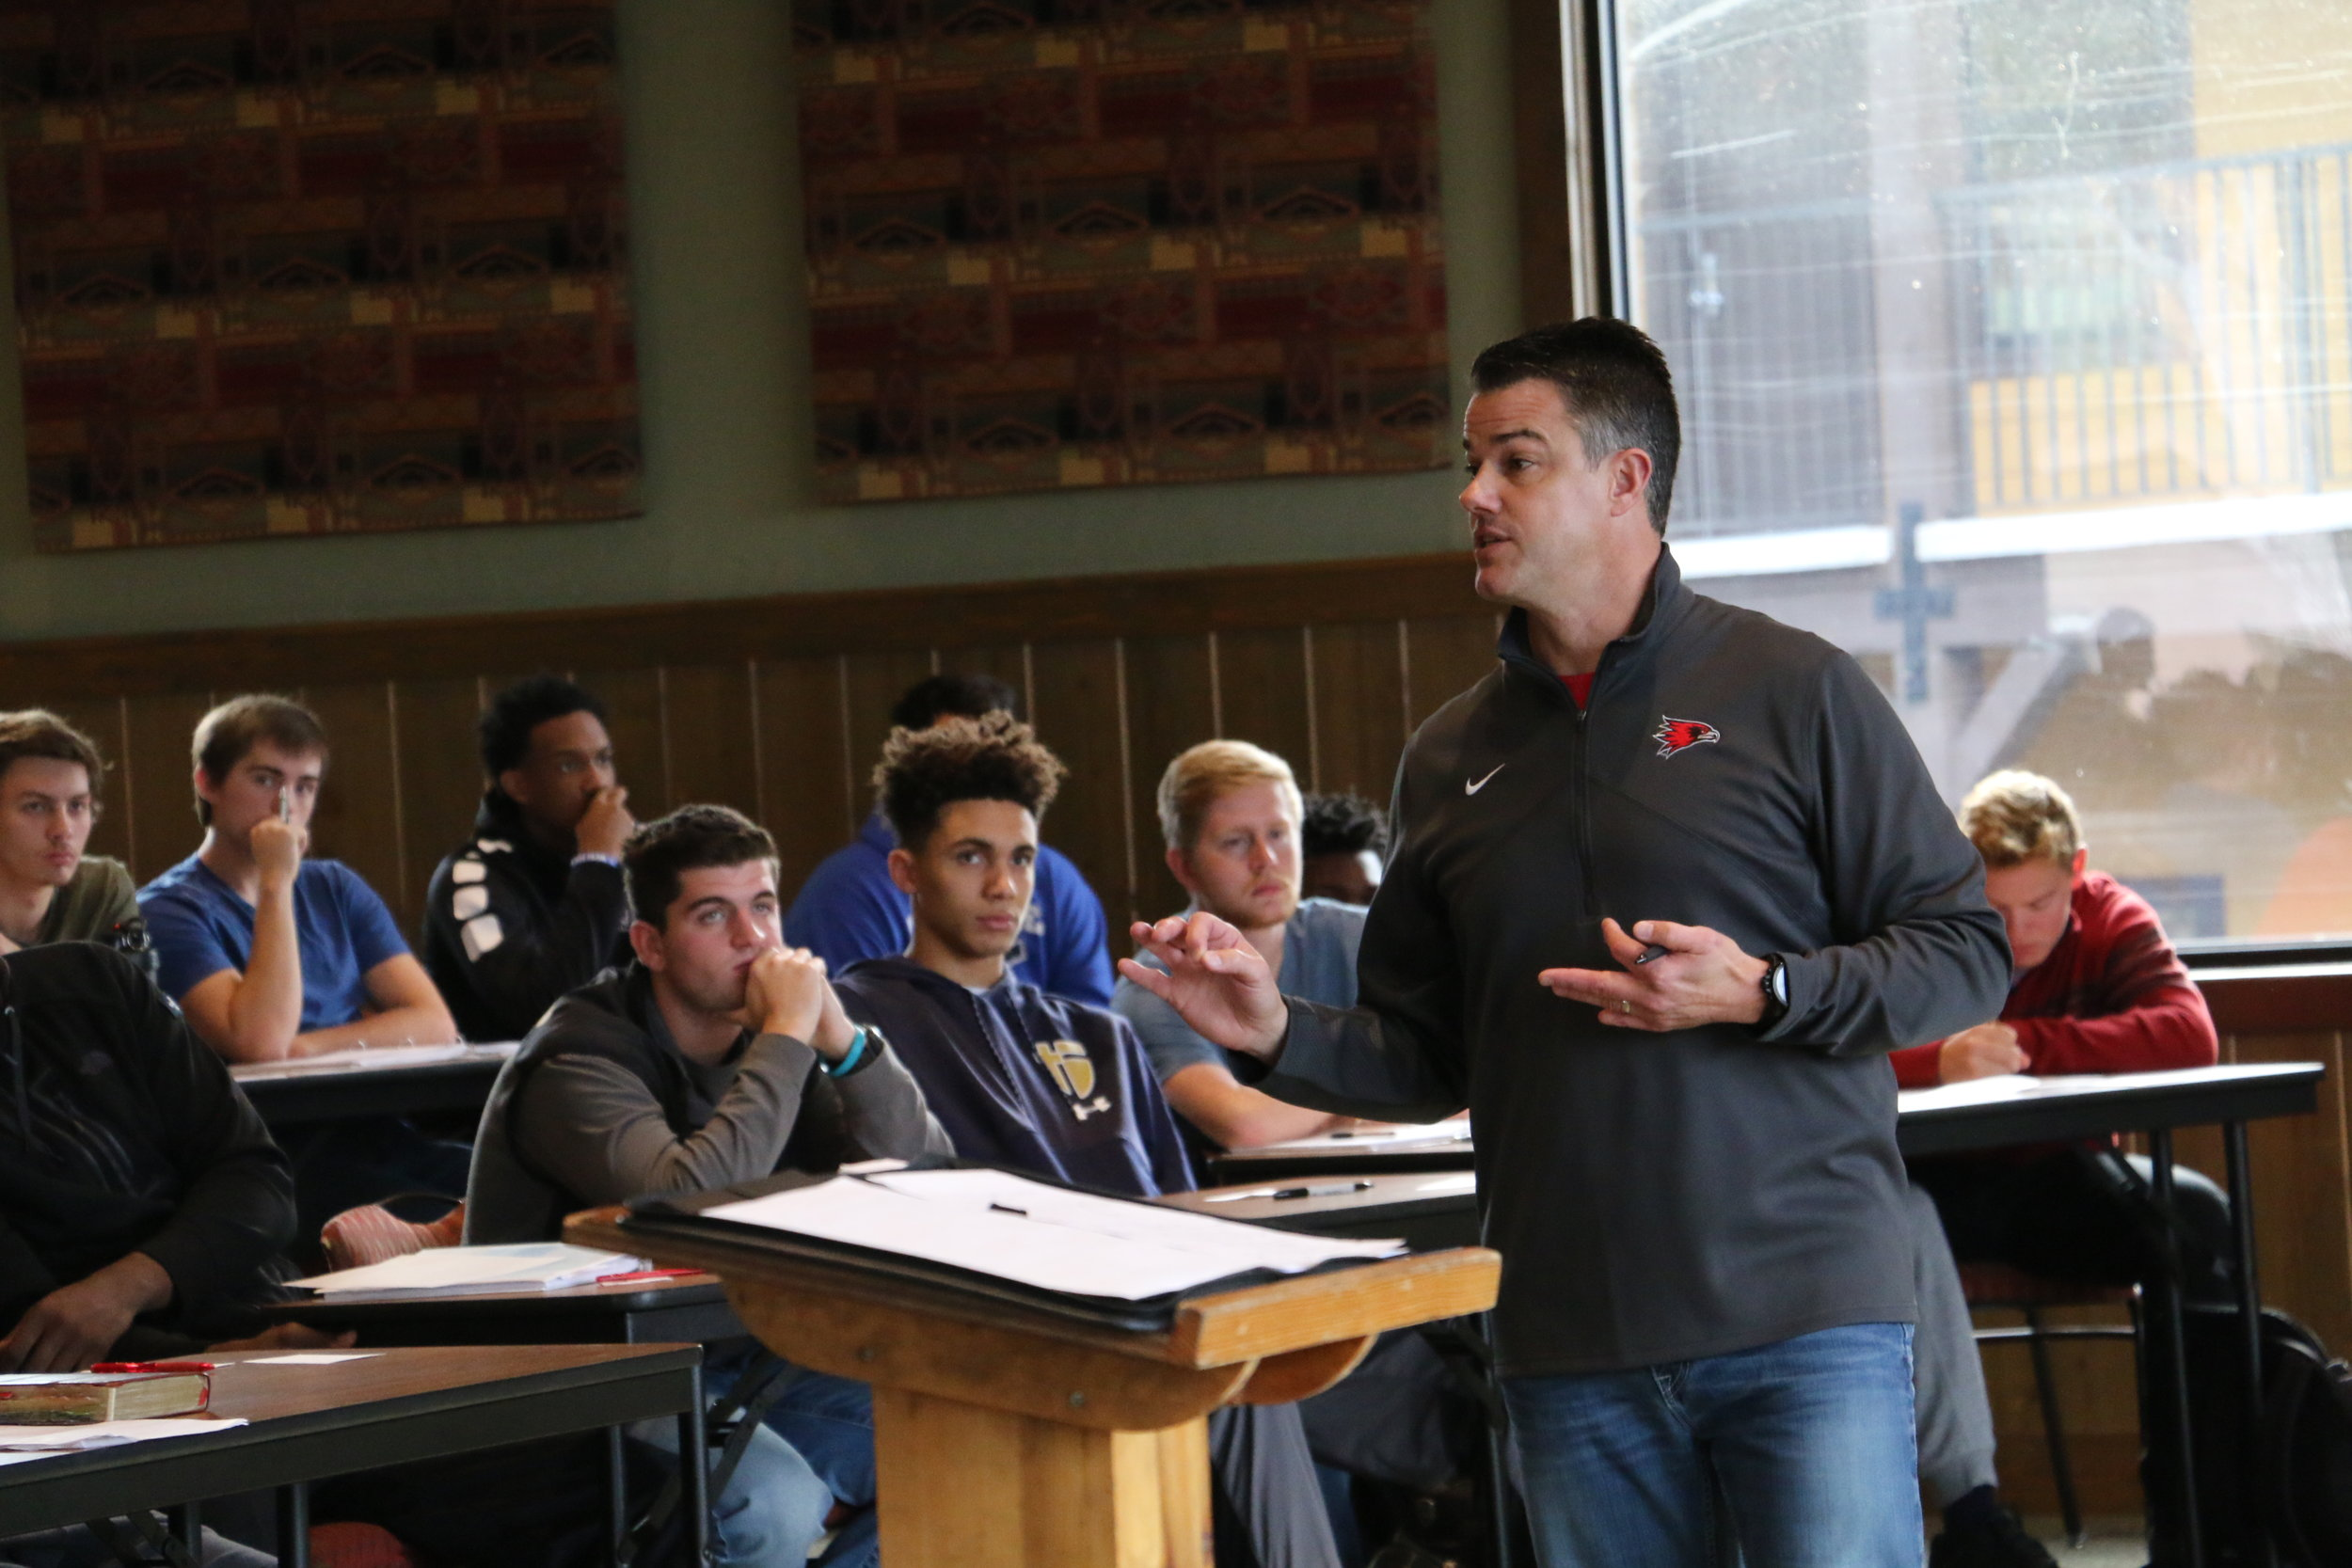 Mr. Harris teaching